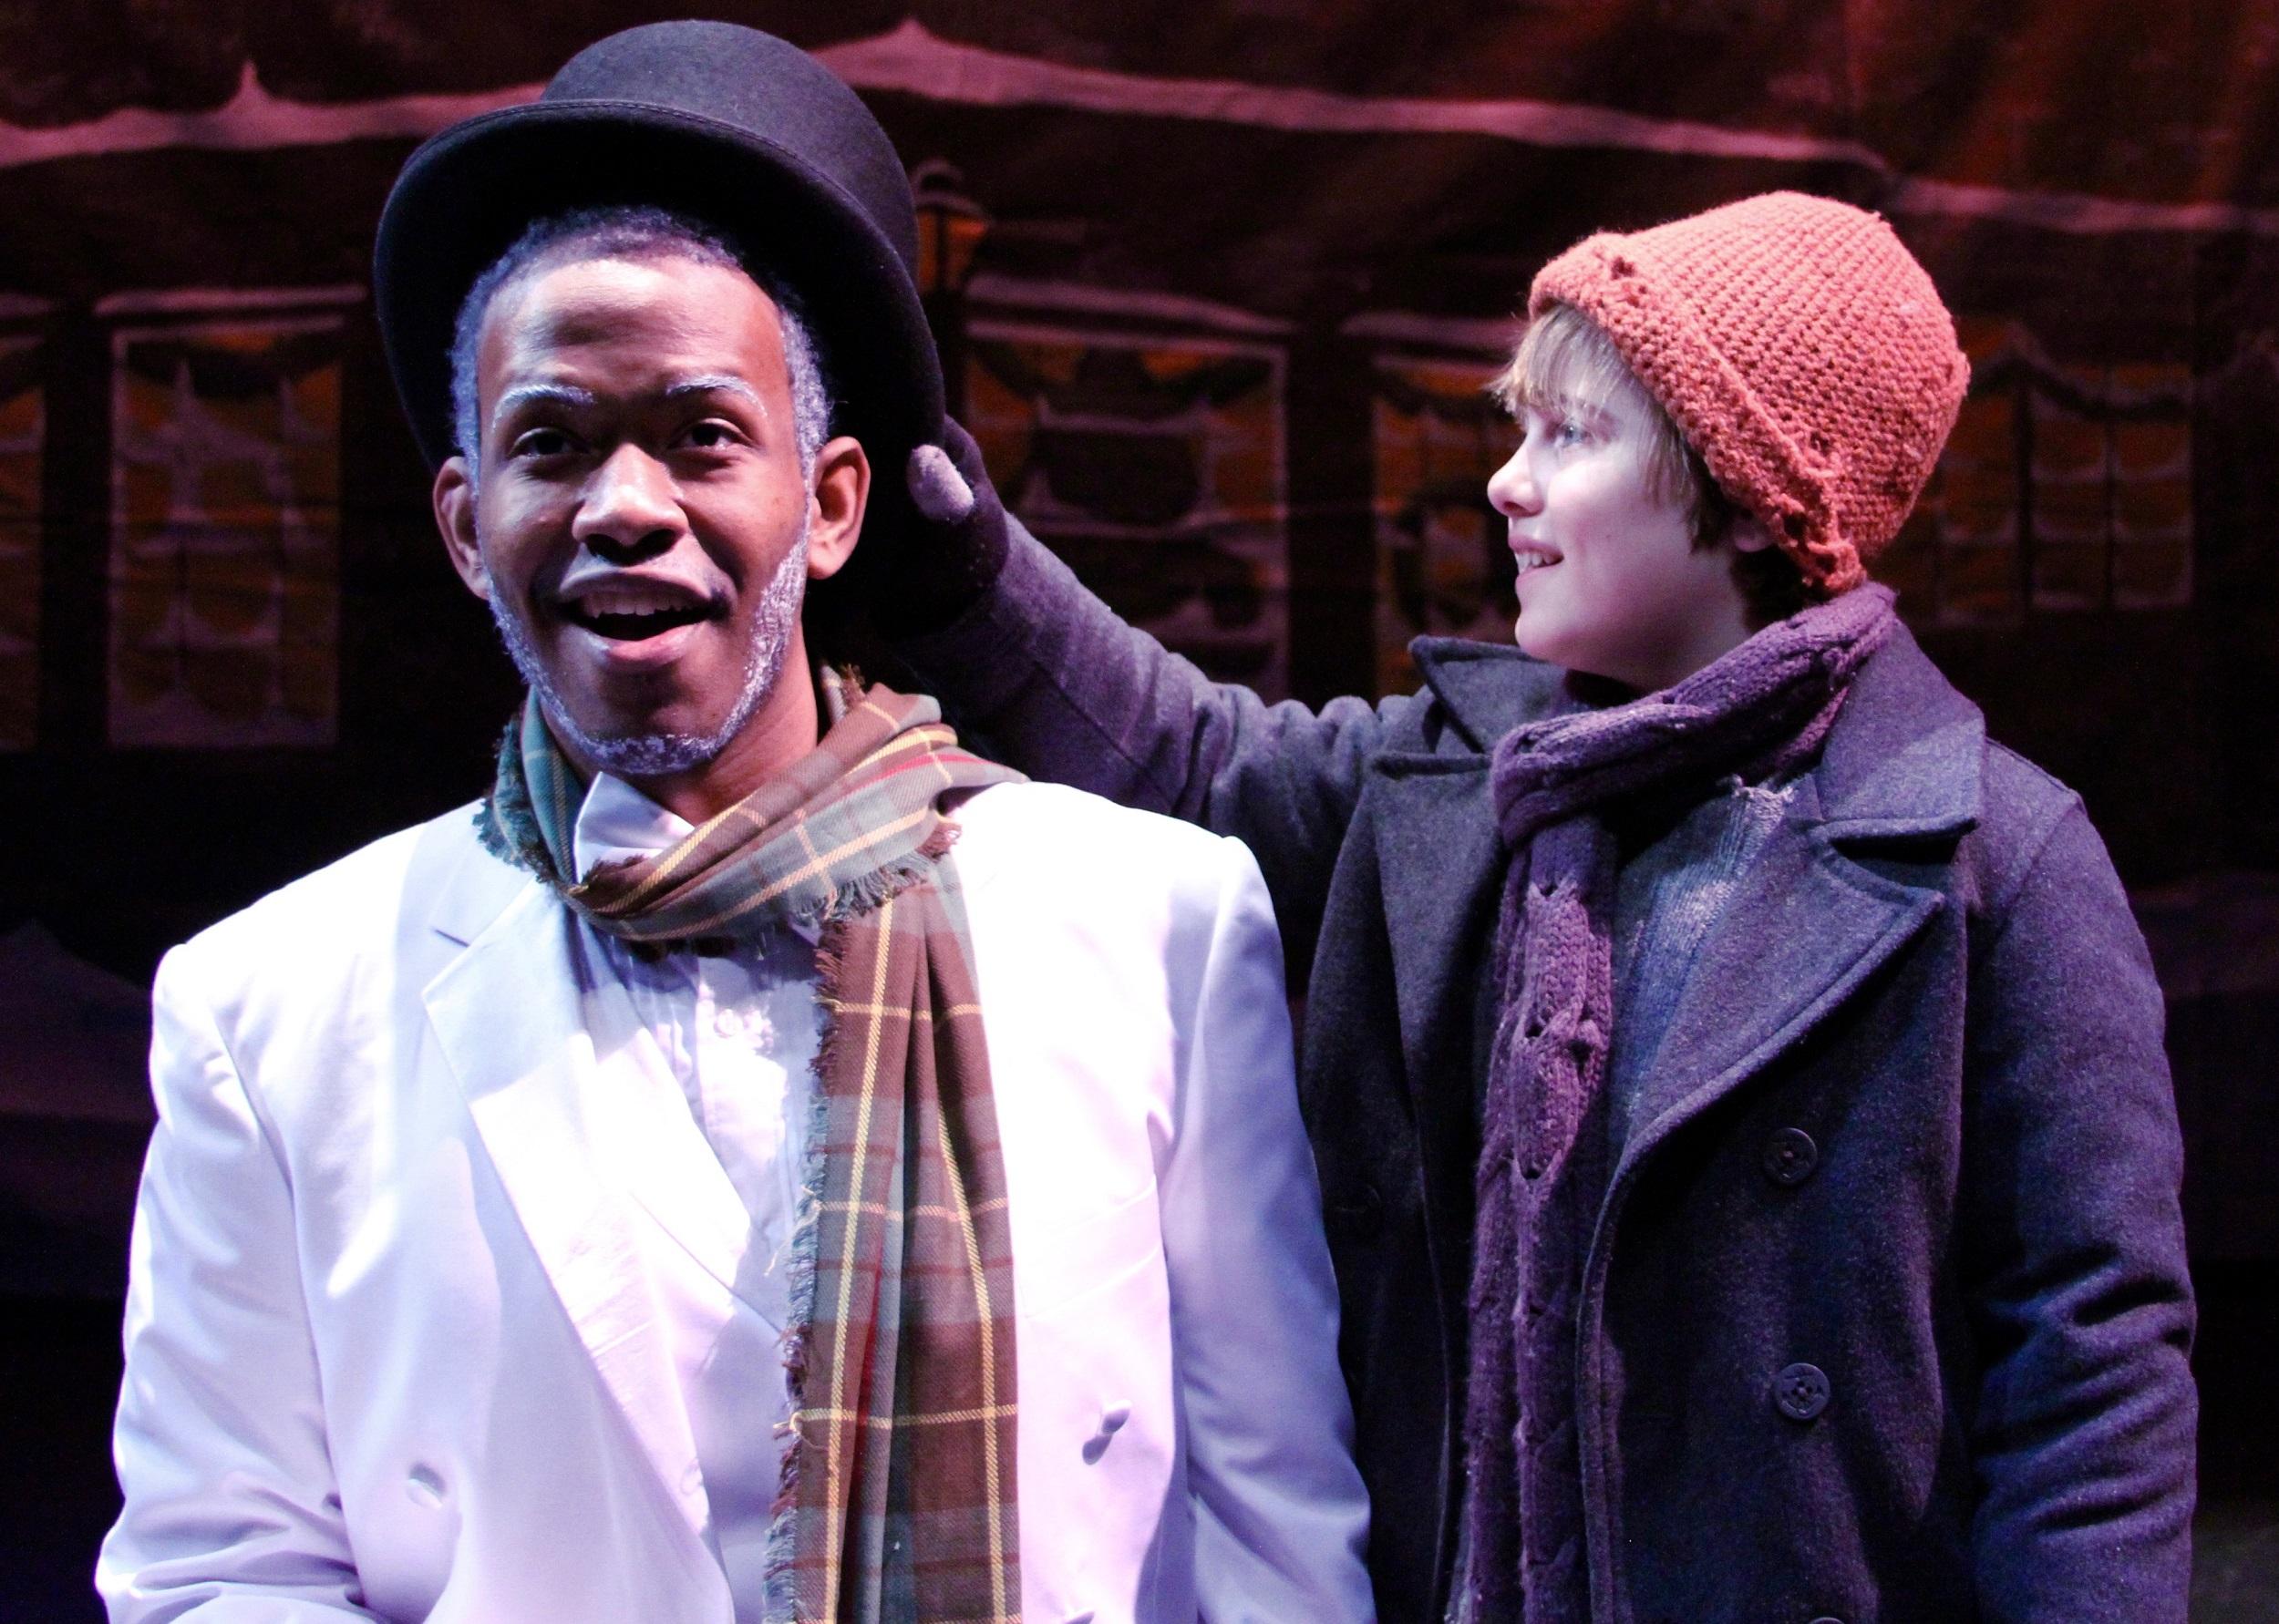 Patrick Clanton as Frosty and Stephen Newton as Billy Photo: Samuel Rushen